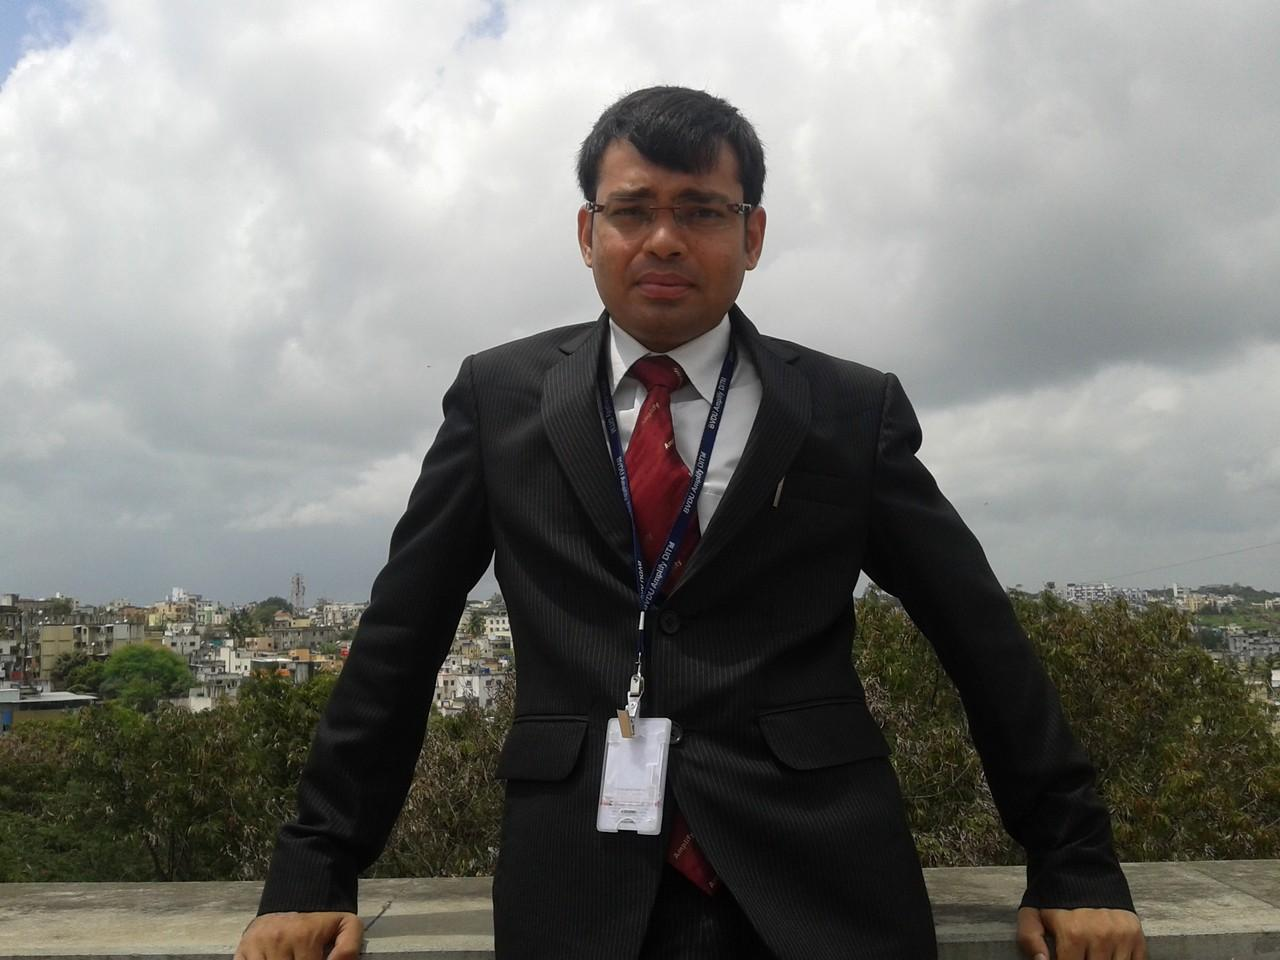 Resume of Nishant S Mevawala